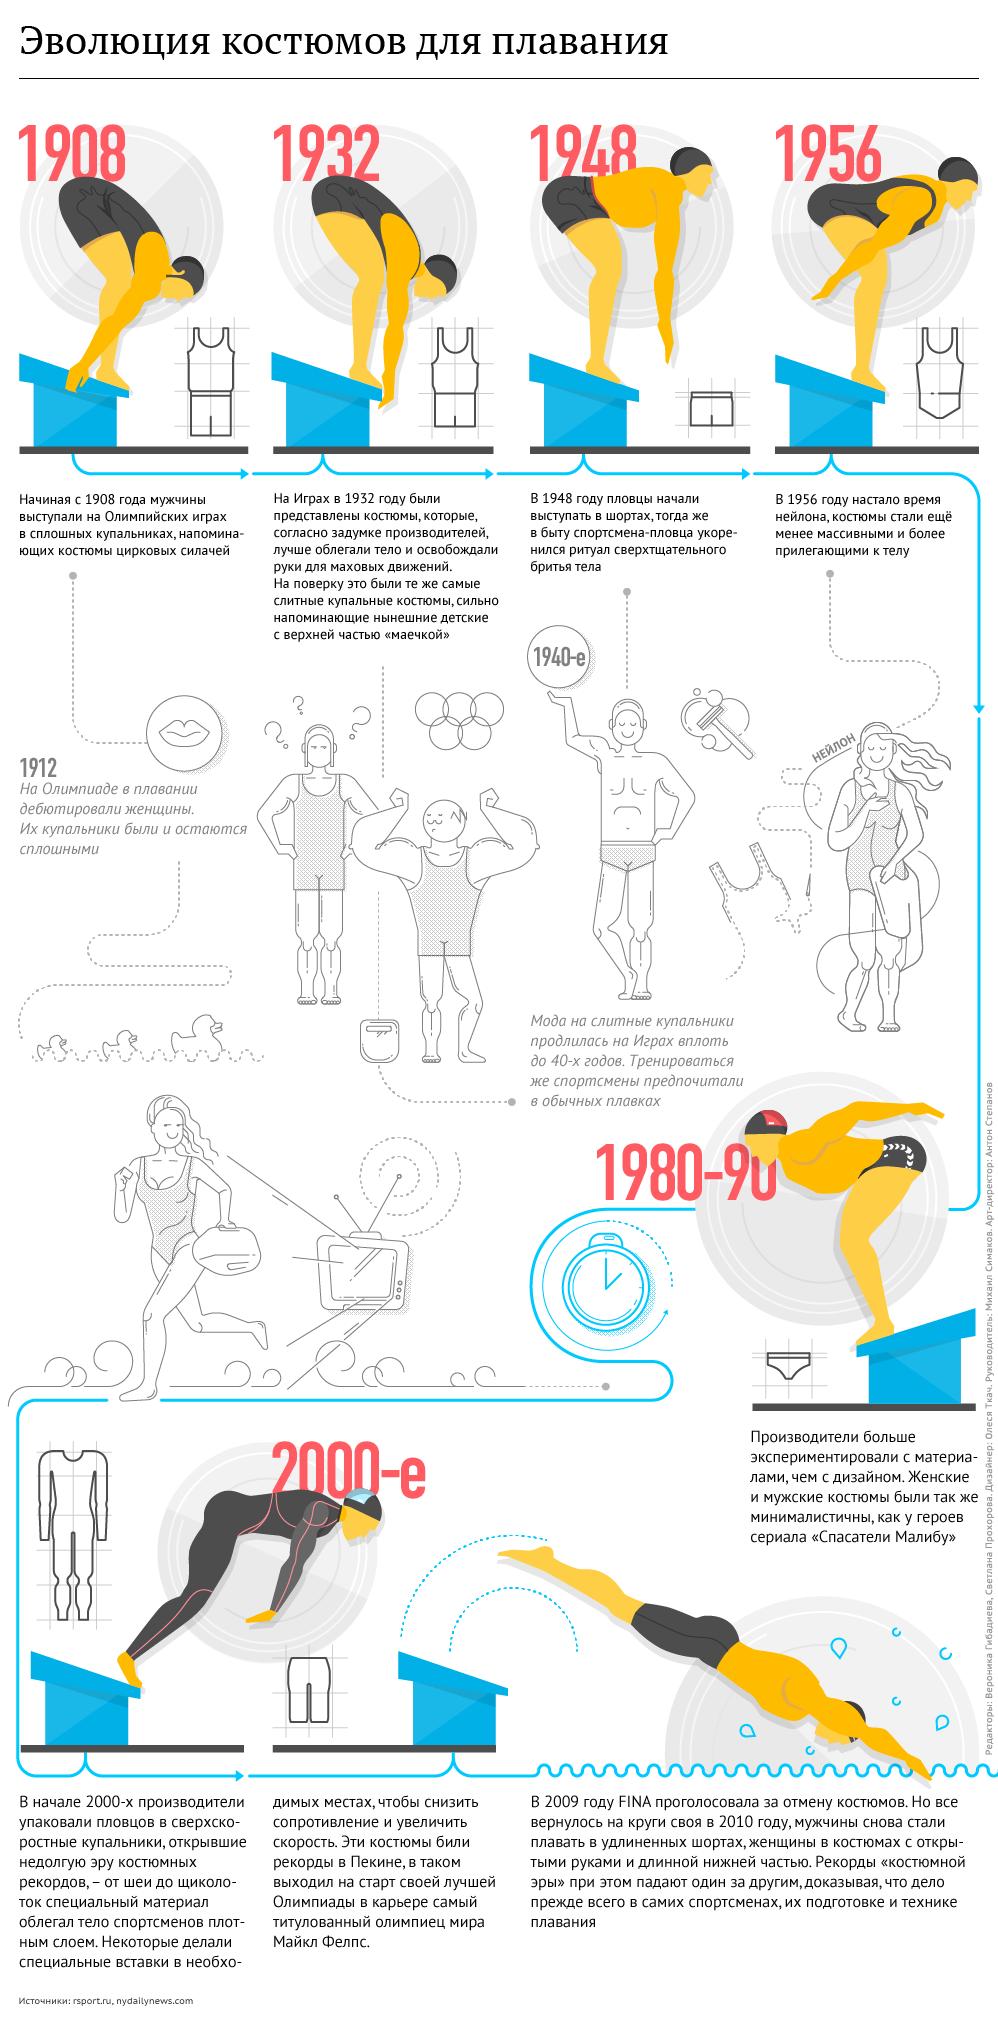 Эволюция костюмов для плавания